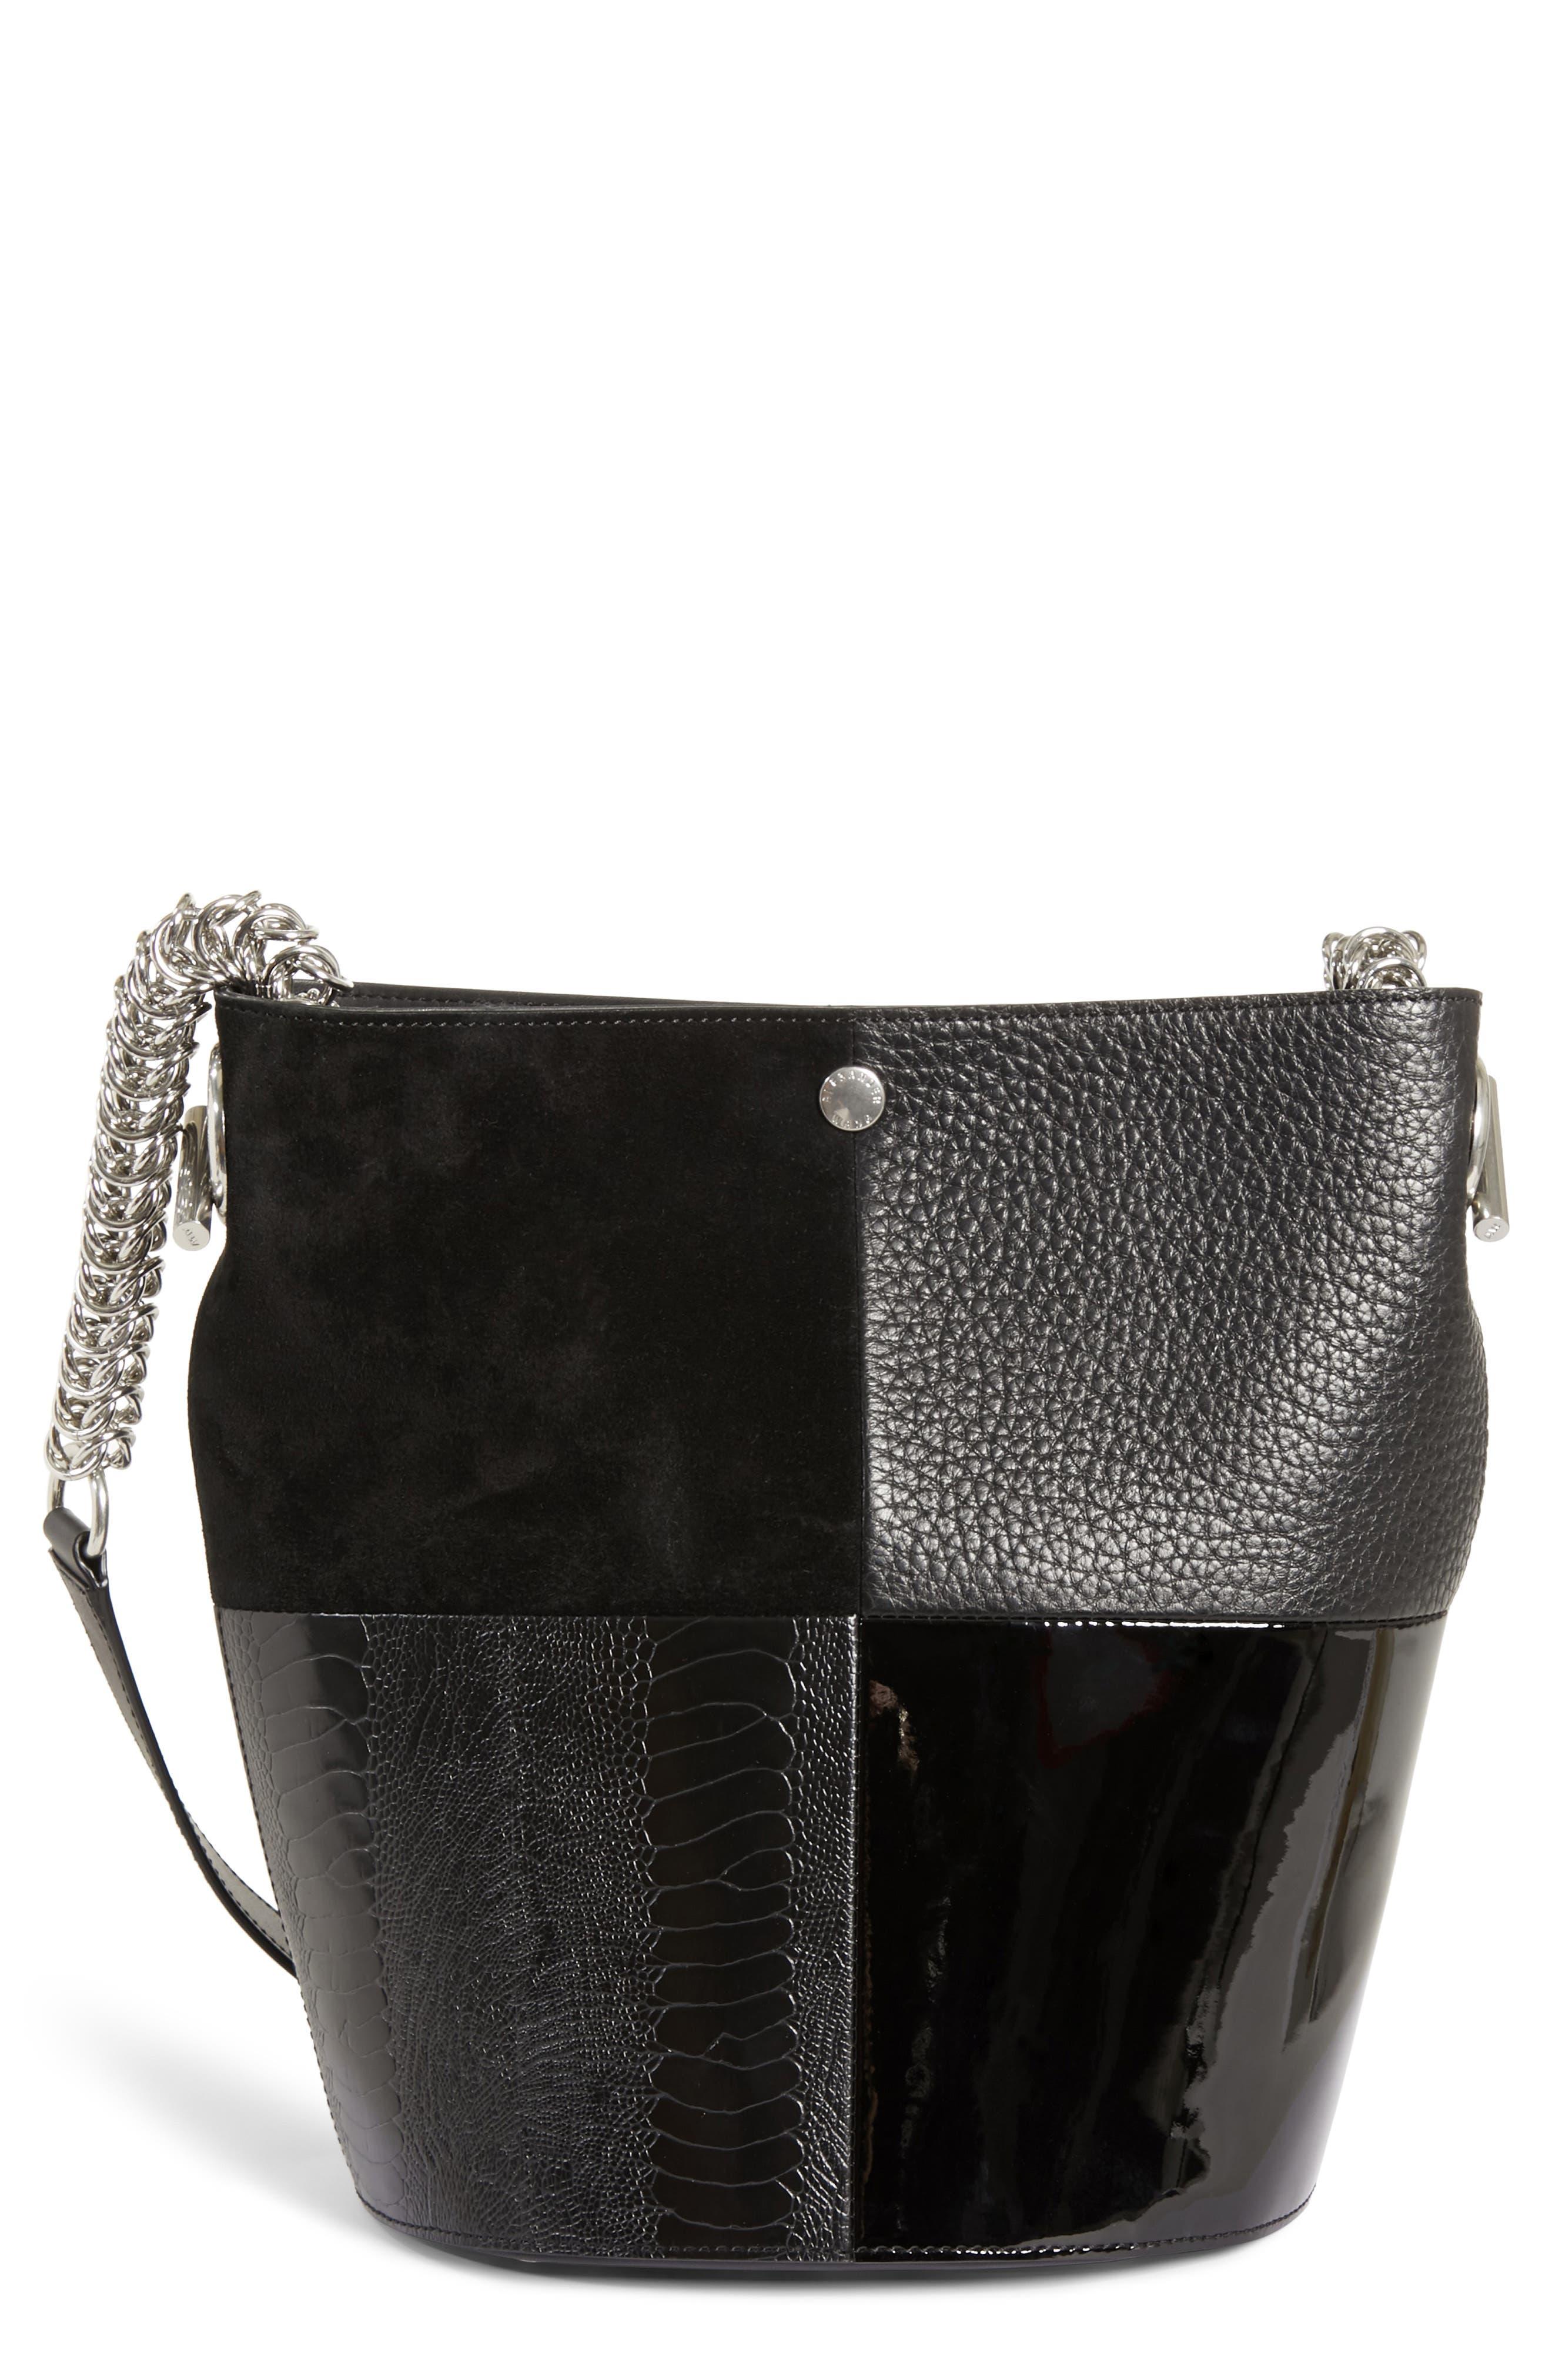 Genesis Patchwork Leather Bucket Bag,                             Main thumbnail 1, color,                             BLACK